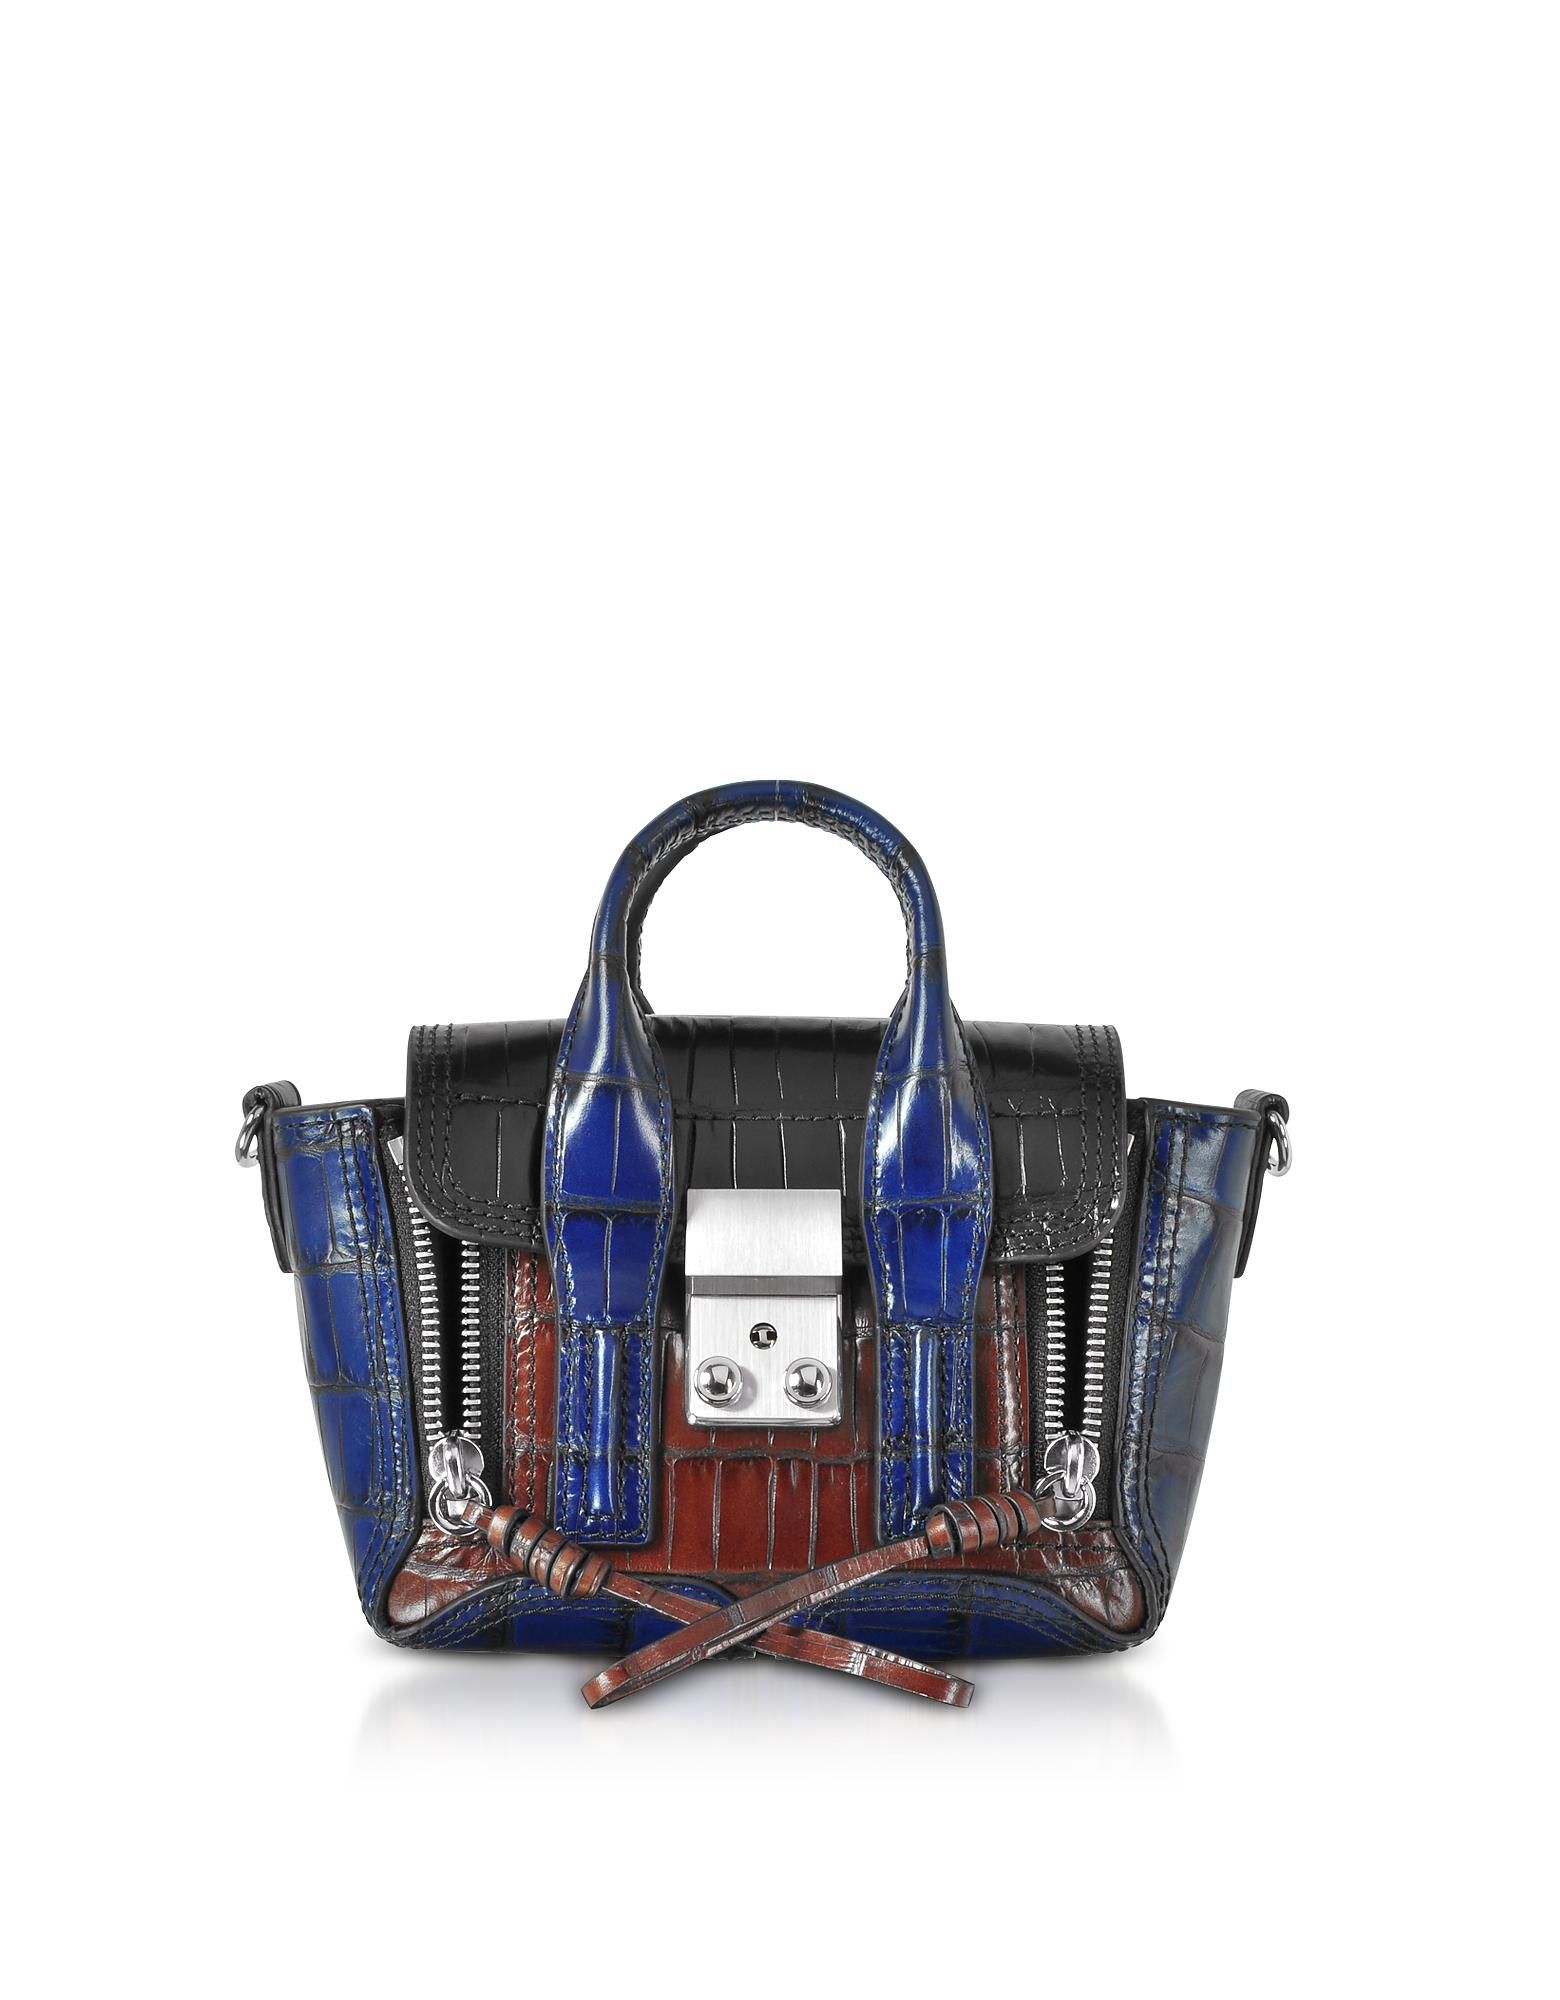 3.1 Phillip Lim Handbags, Croco Leather Pashli Nano Satchel